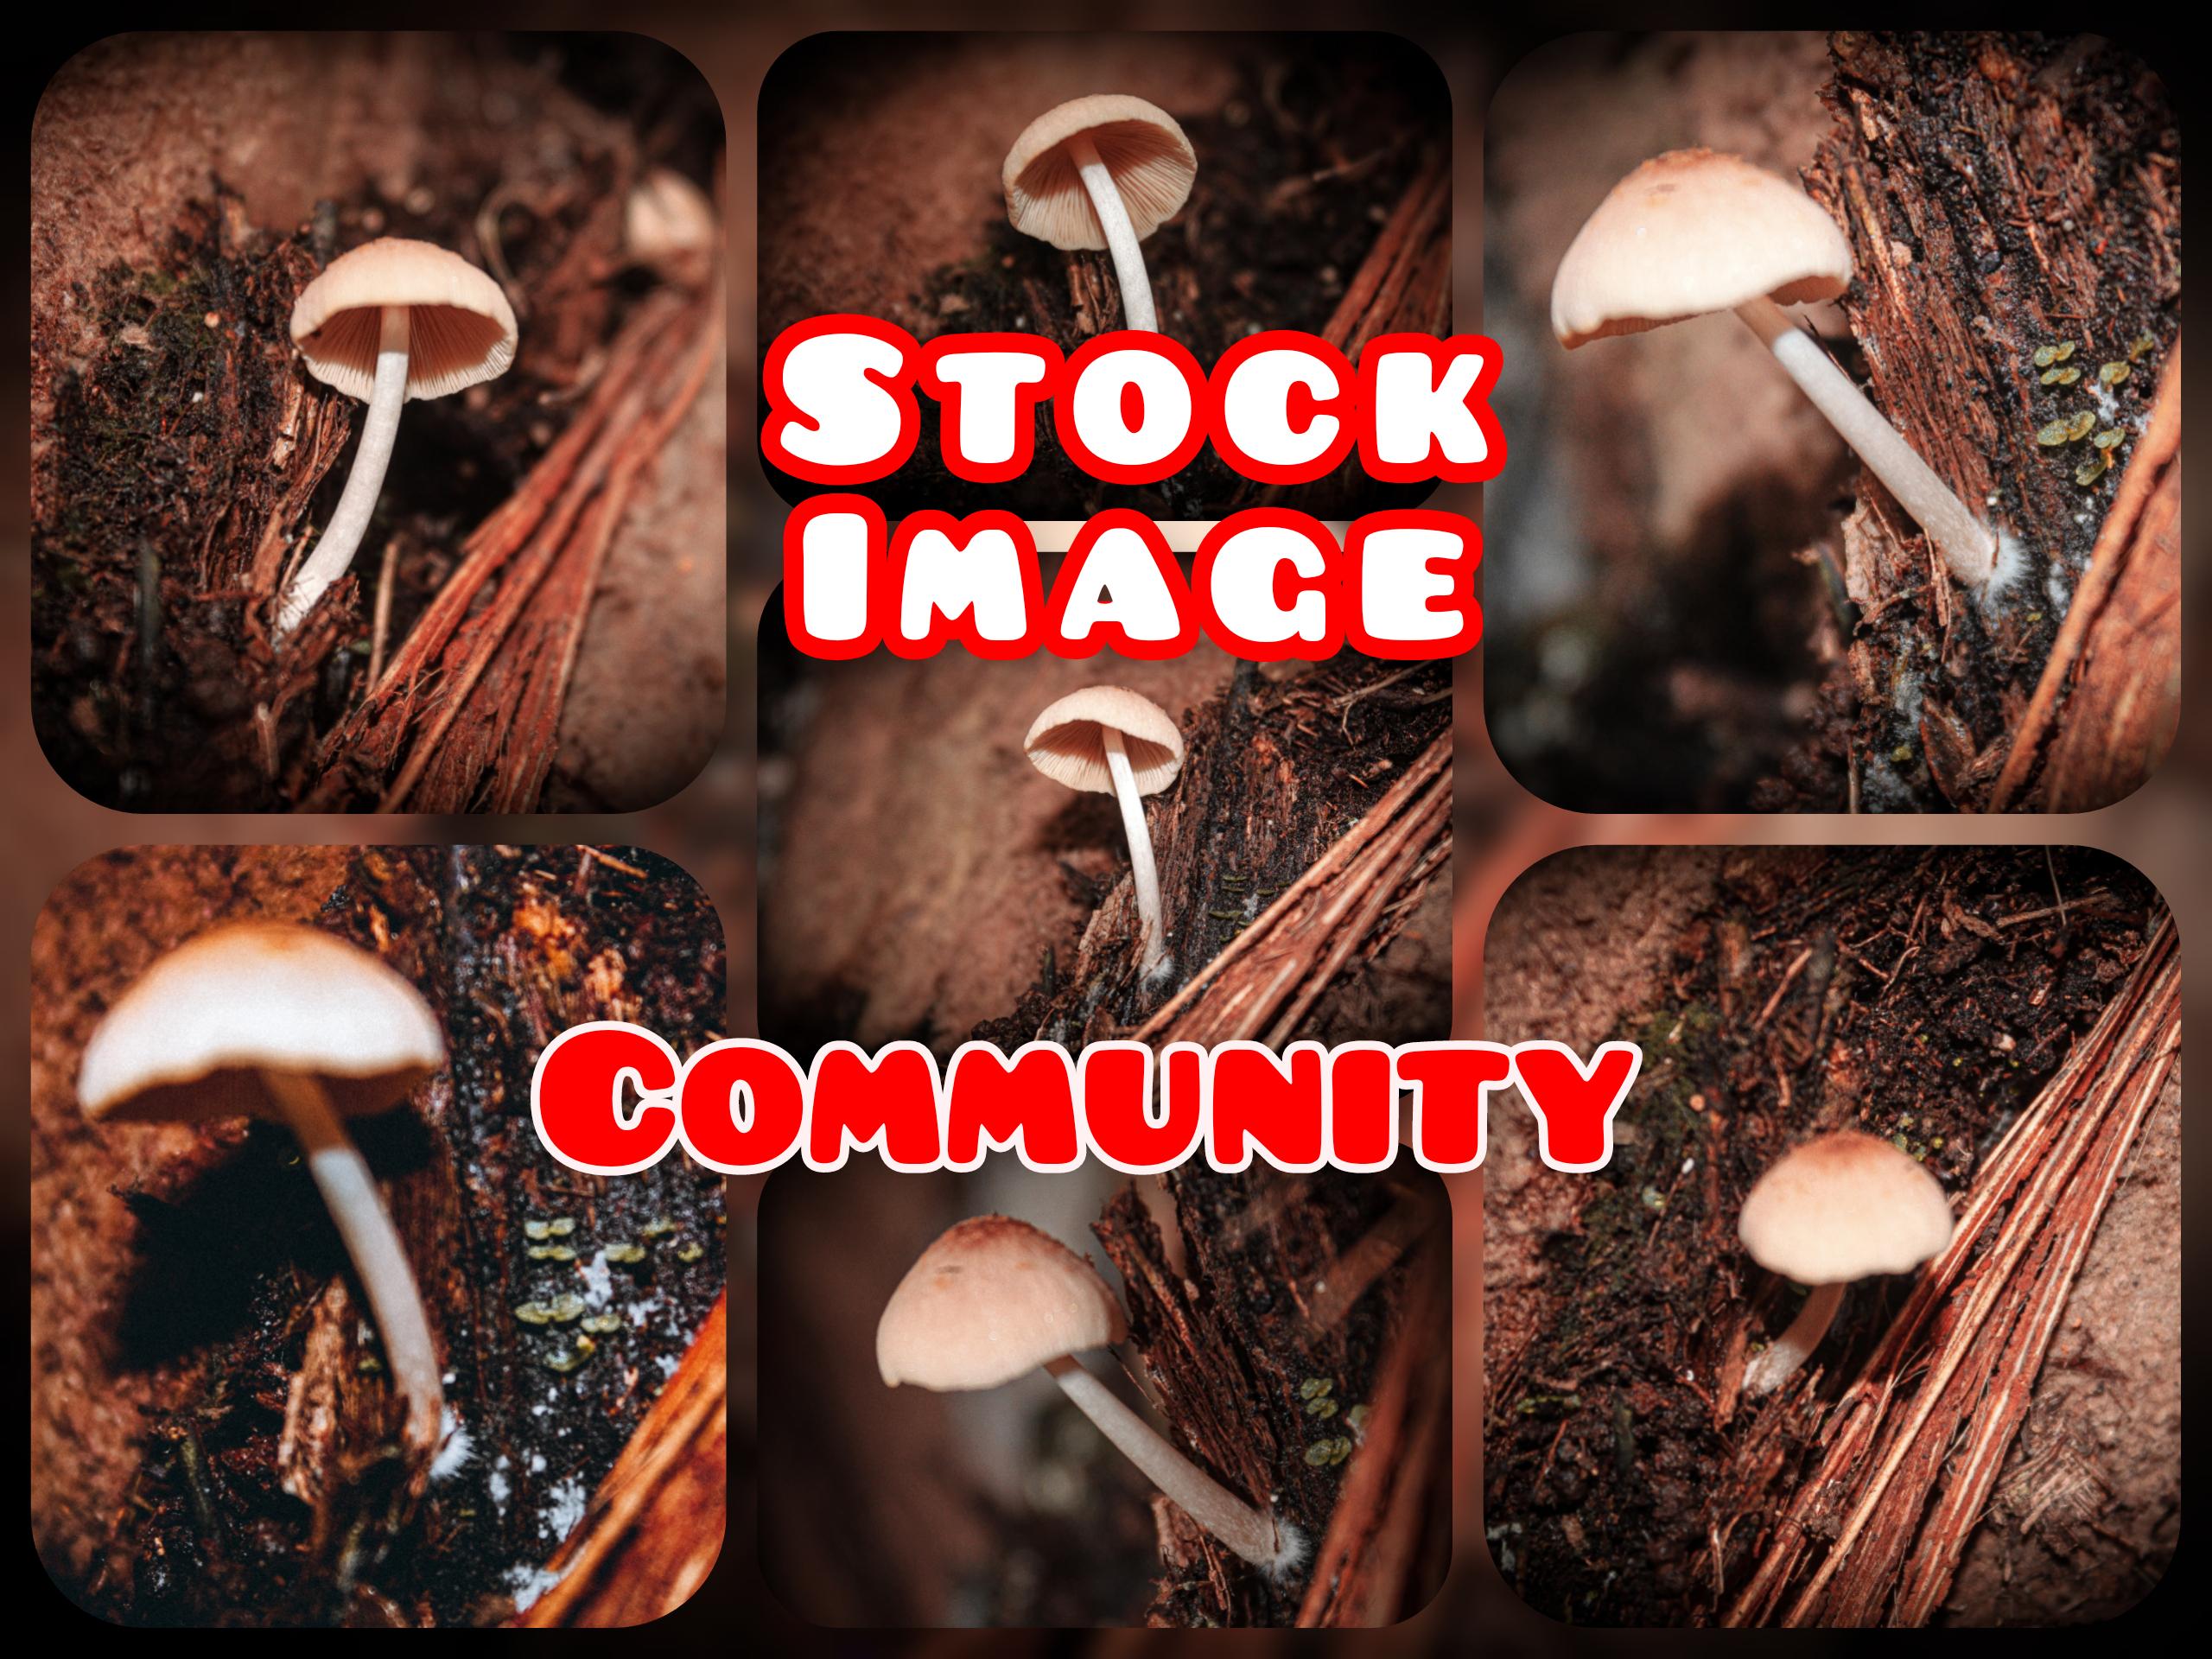 inCollage_20210729_111422701.jpg